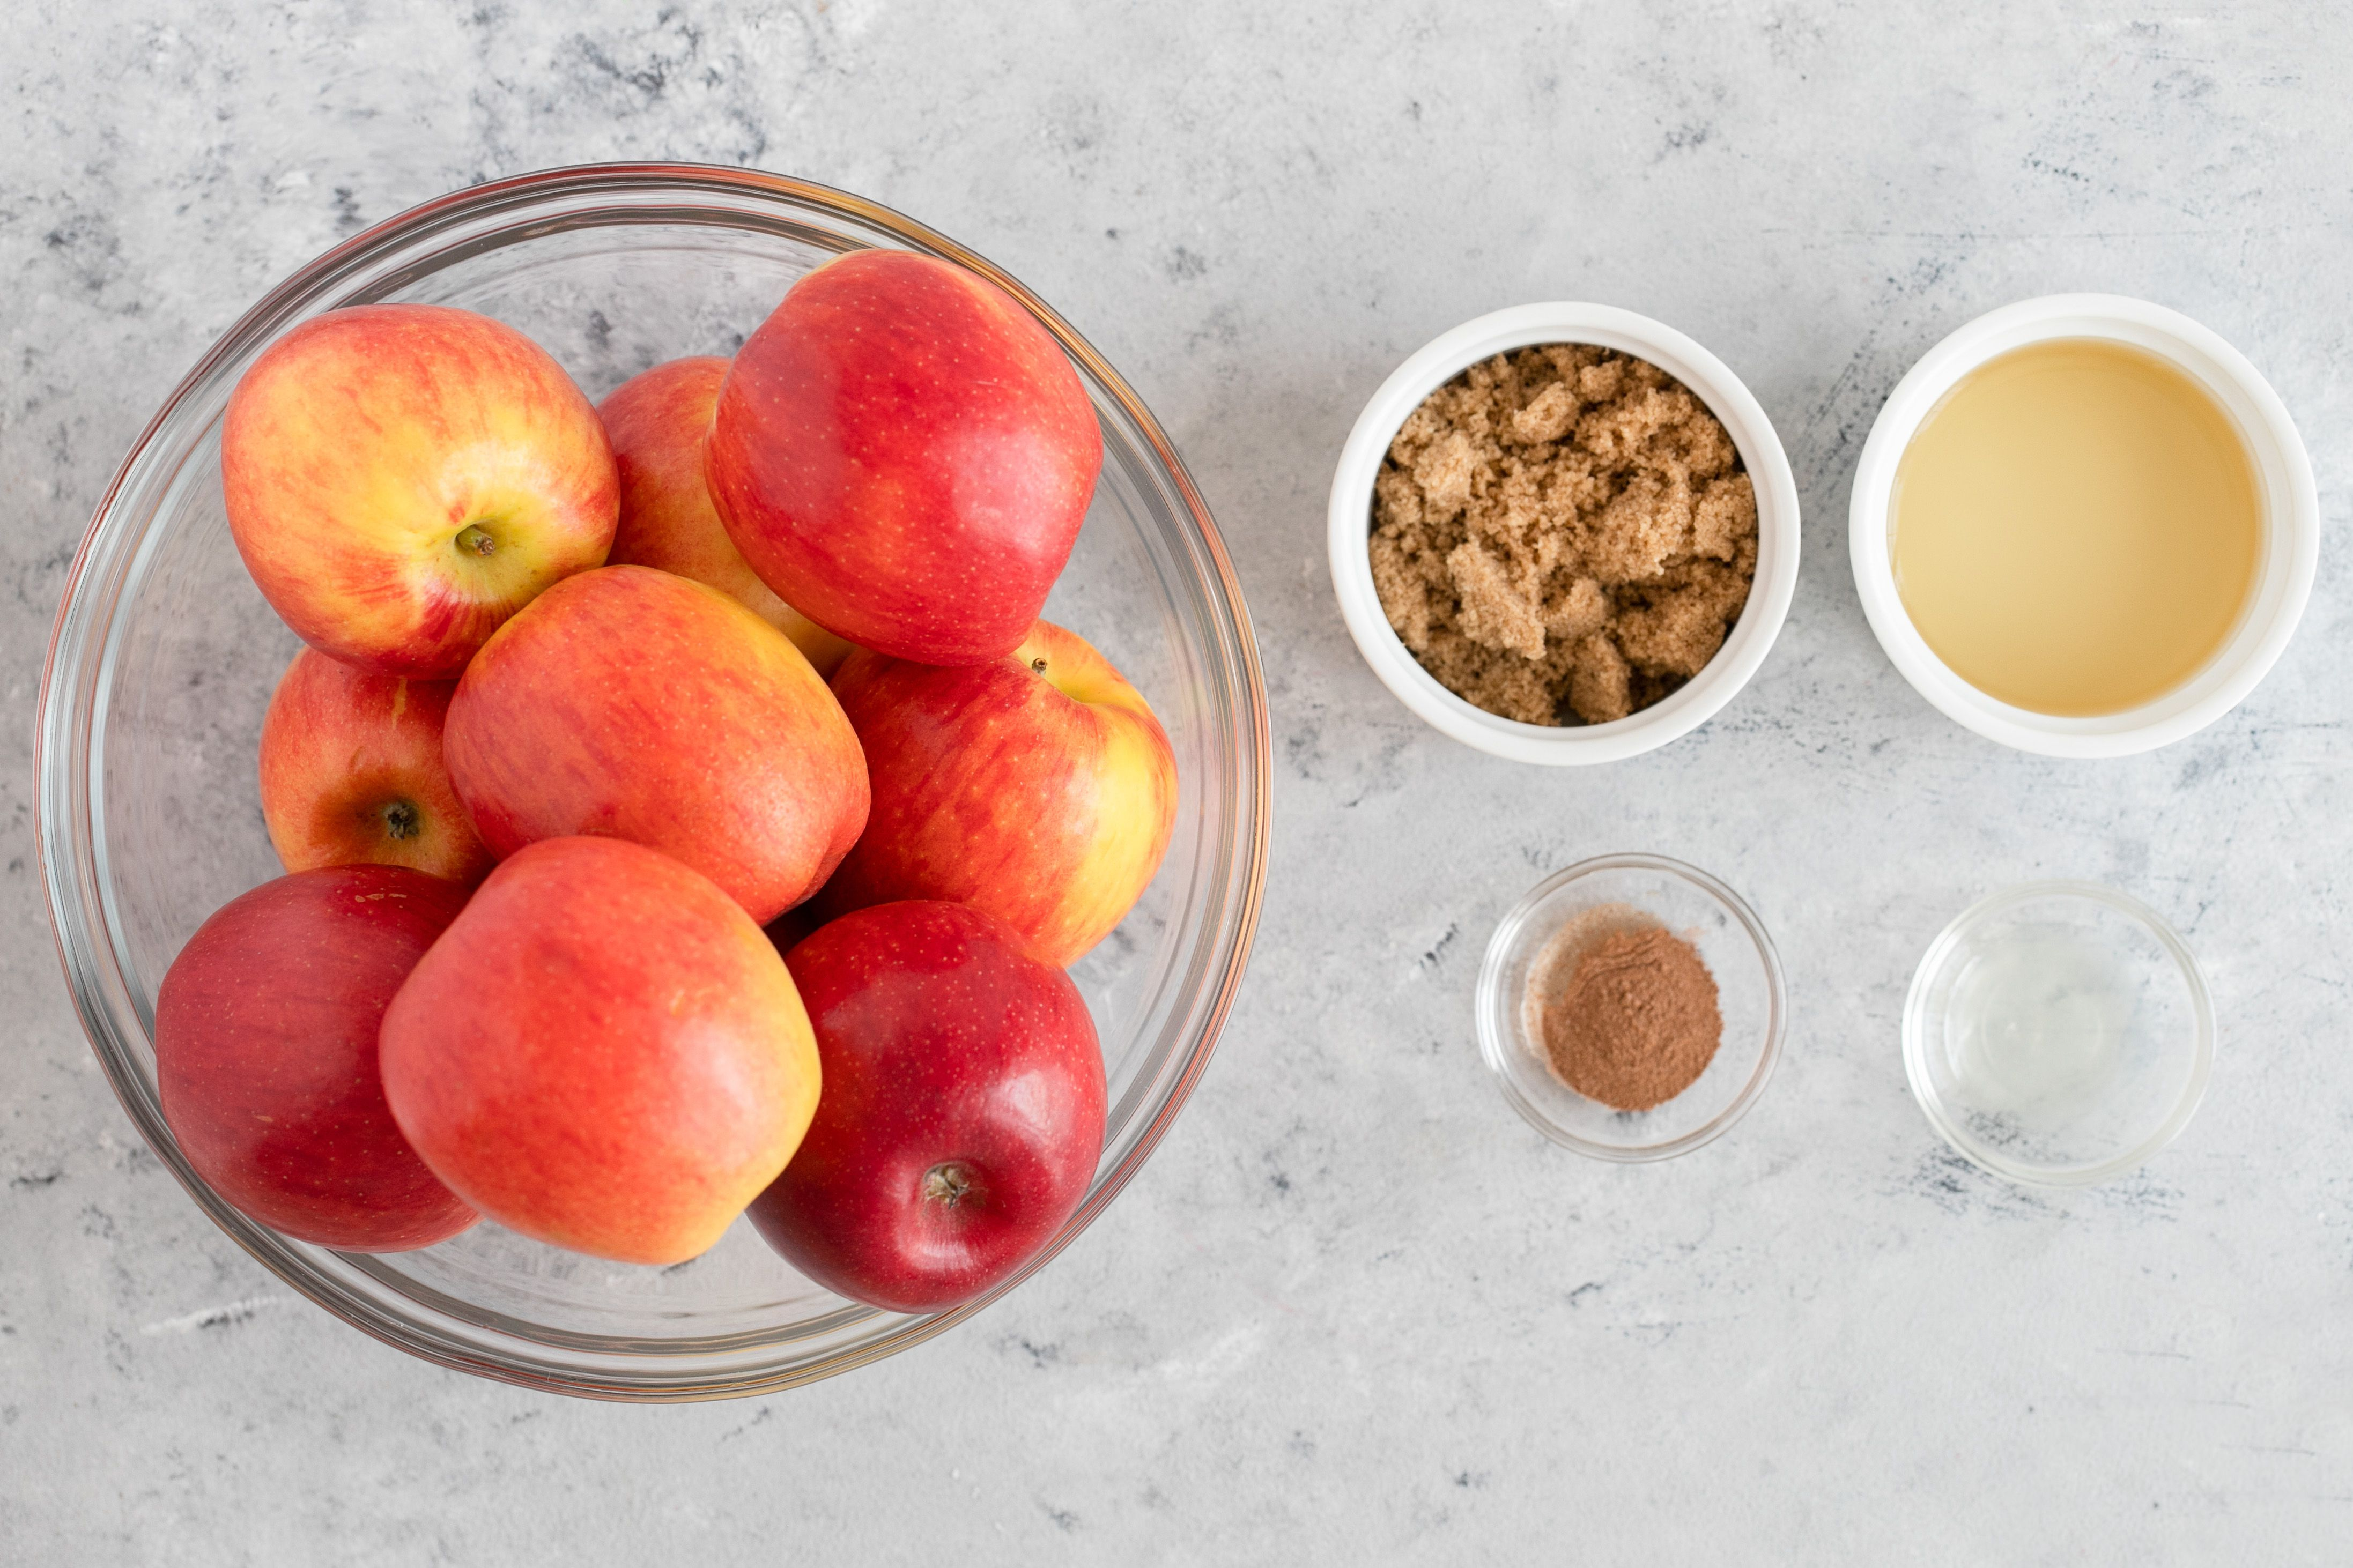 Ingredients for applesauce